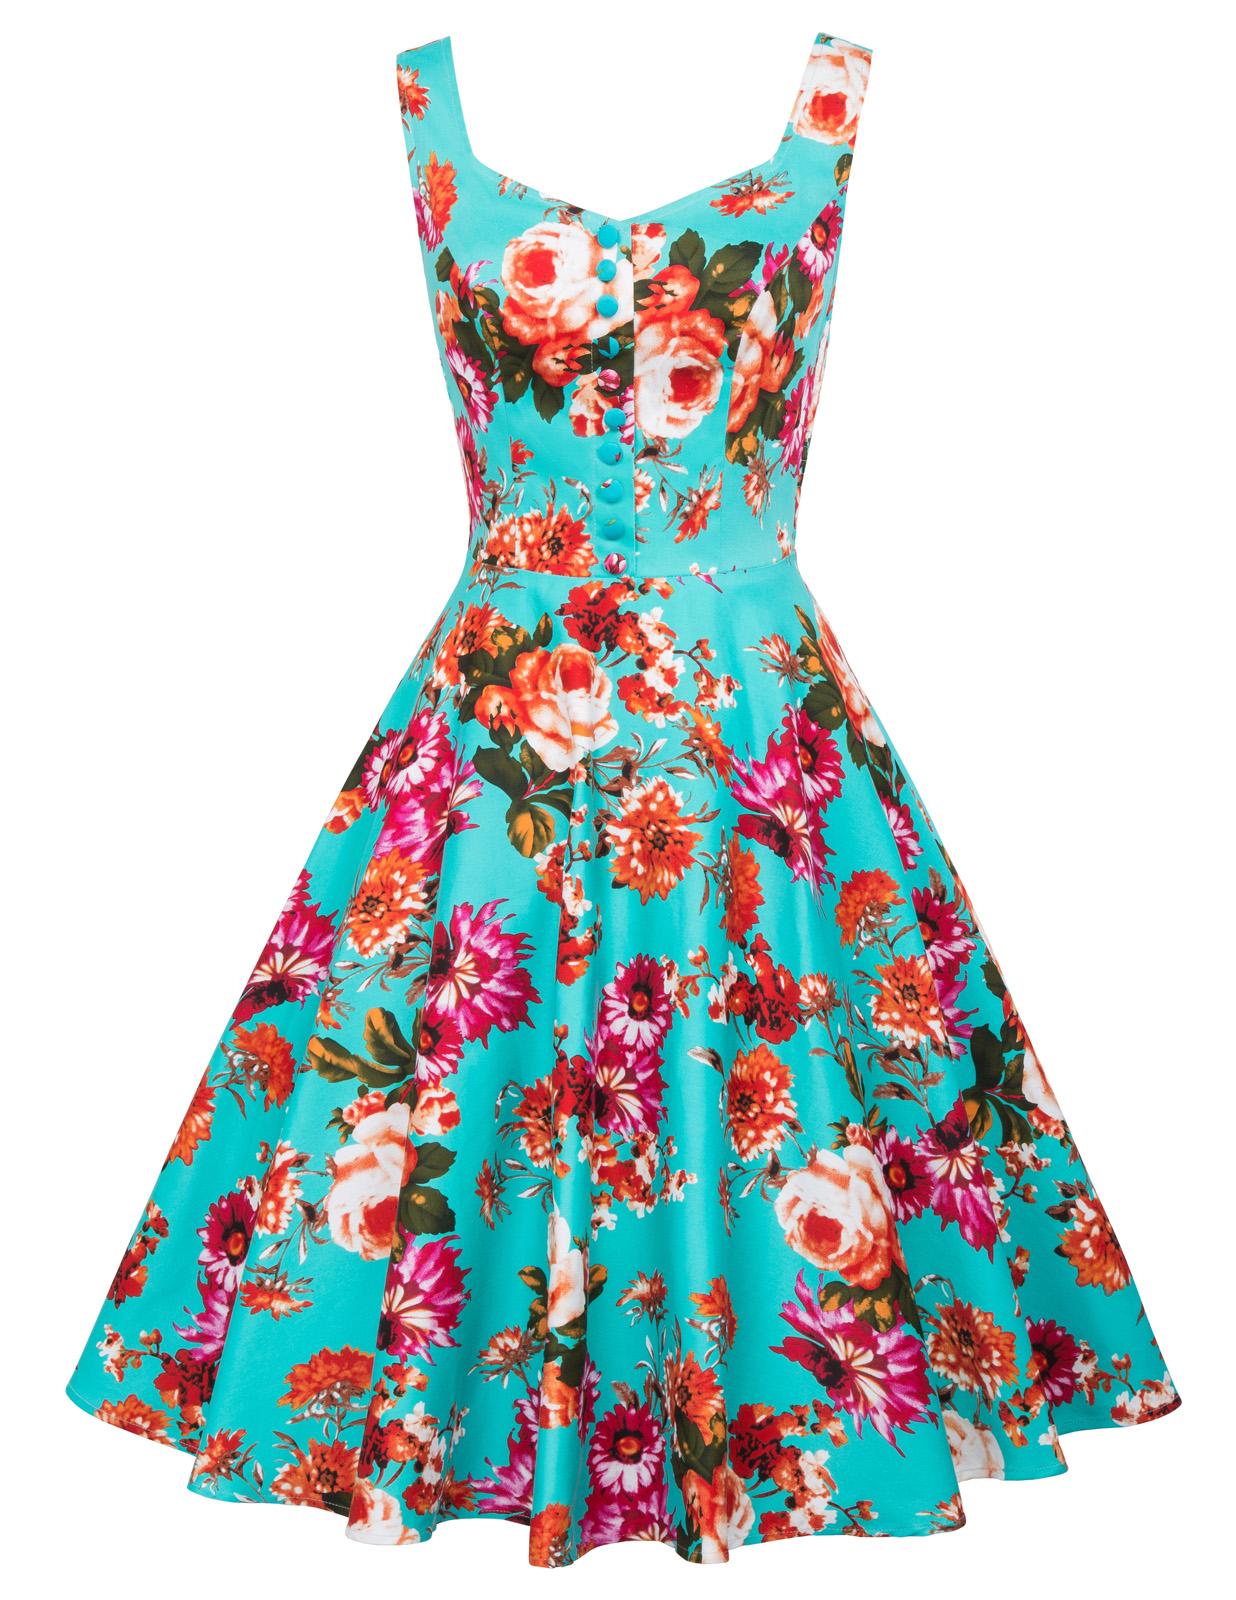 Women-039-s-Vintage-Retro-Style-1950s-60s-Sleeveless-Floral-Evening-Prom-Swing-Dress